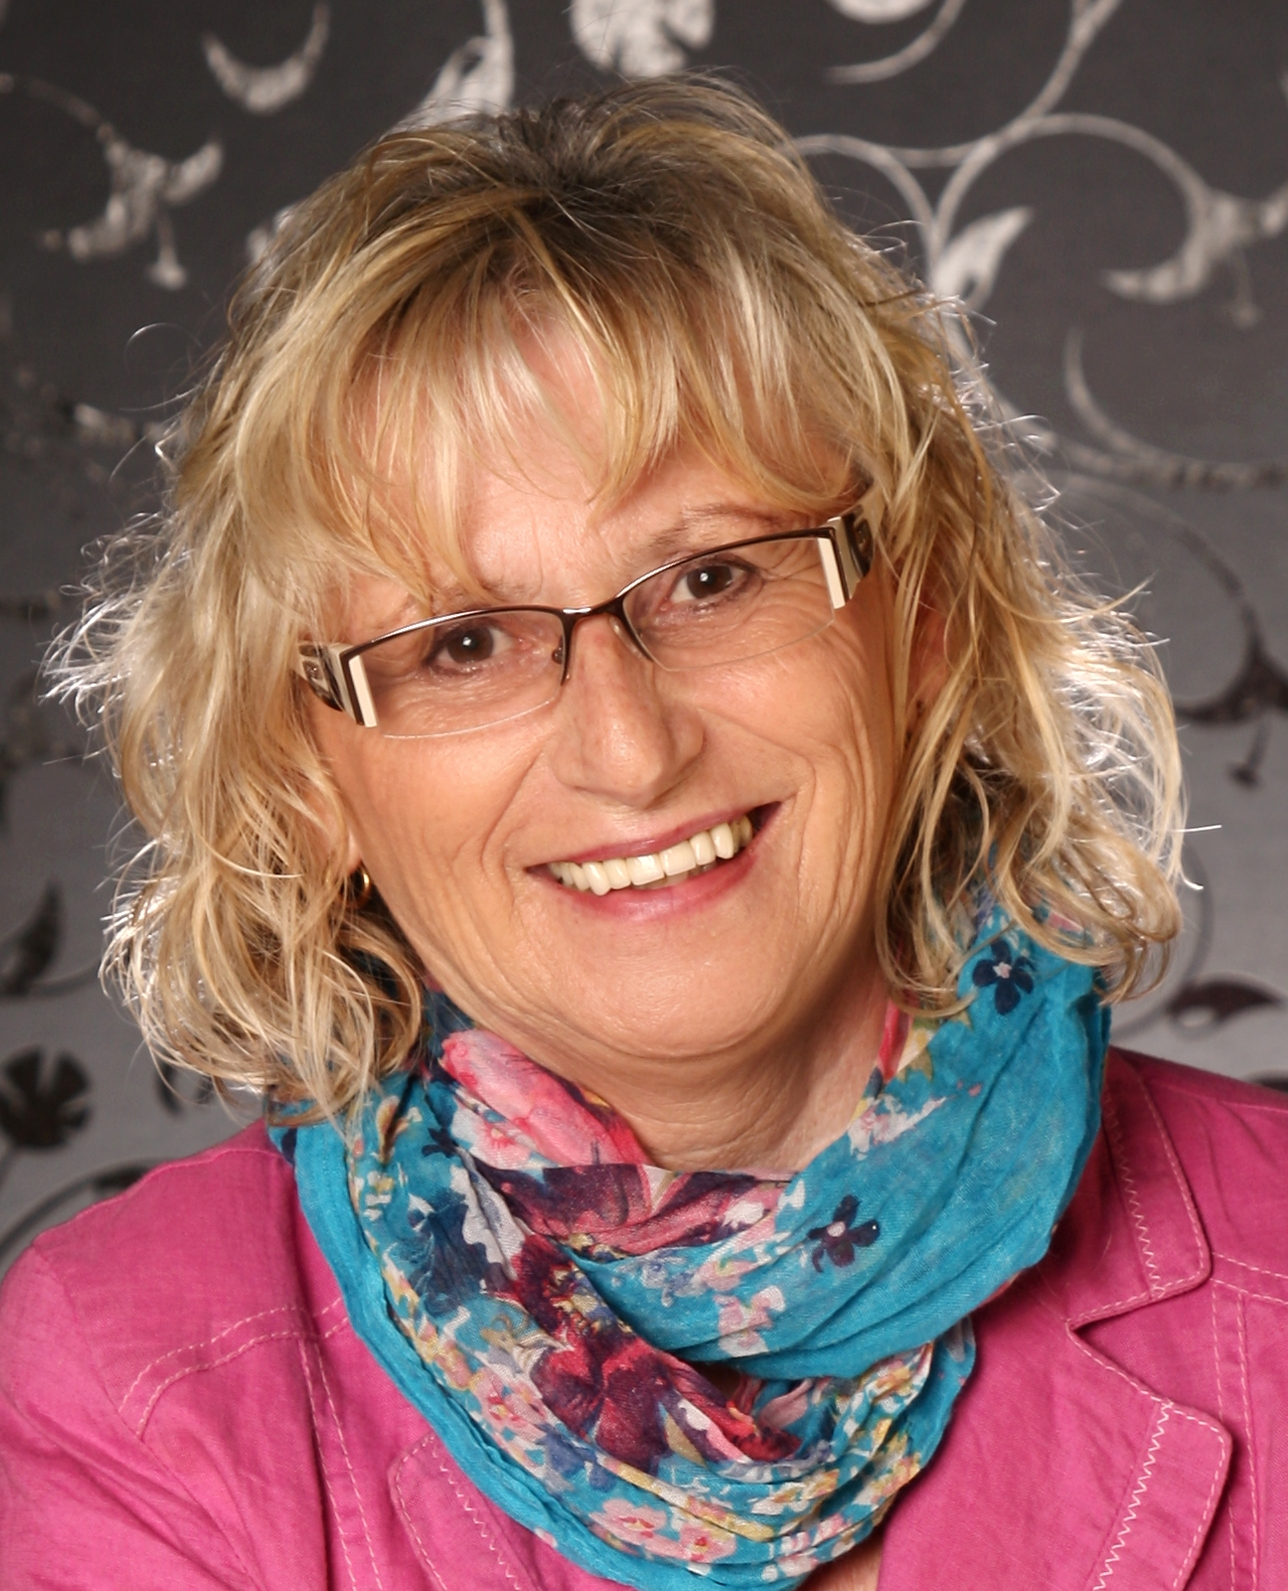 Engellehre - Ulrike Stöckle